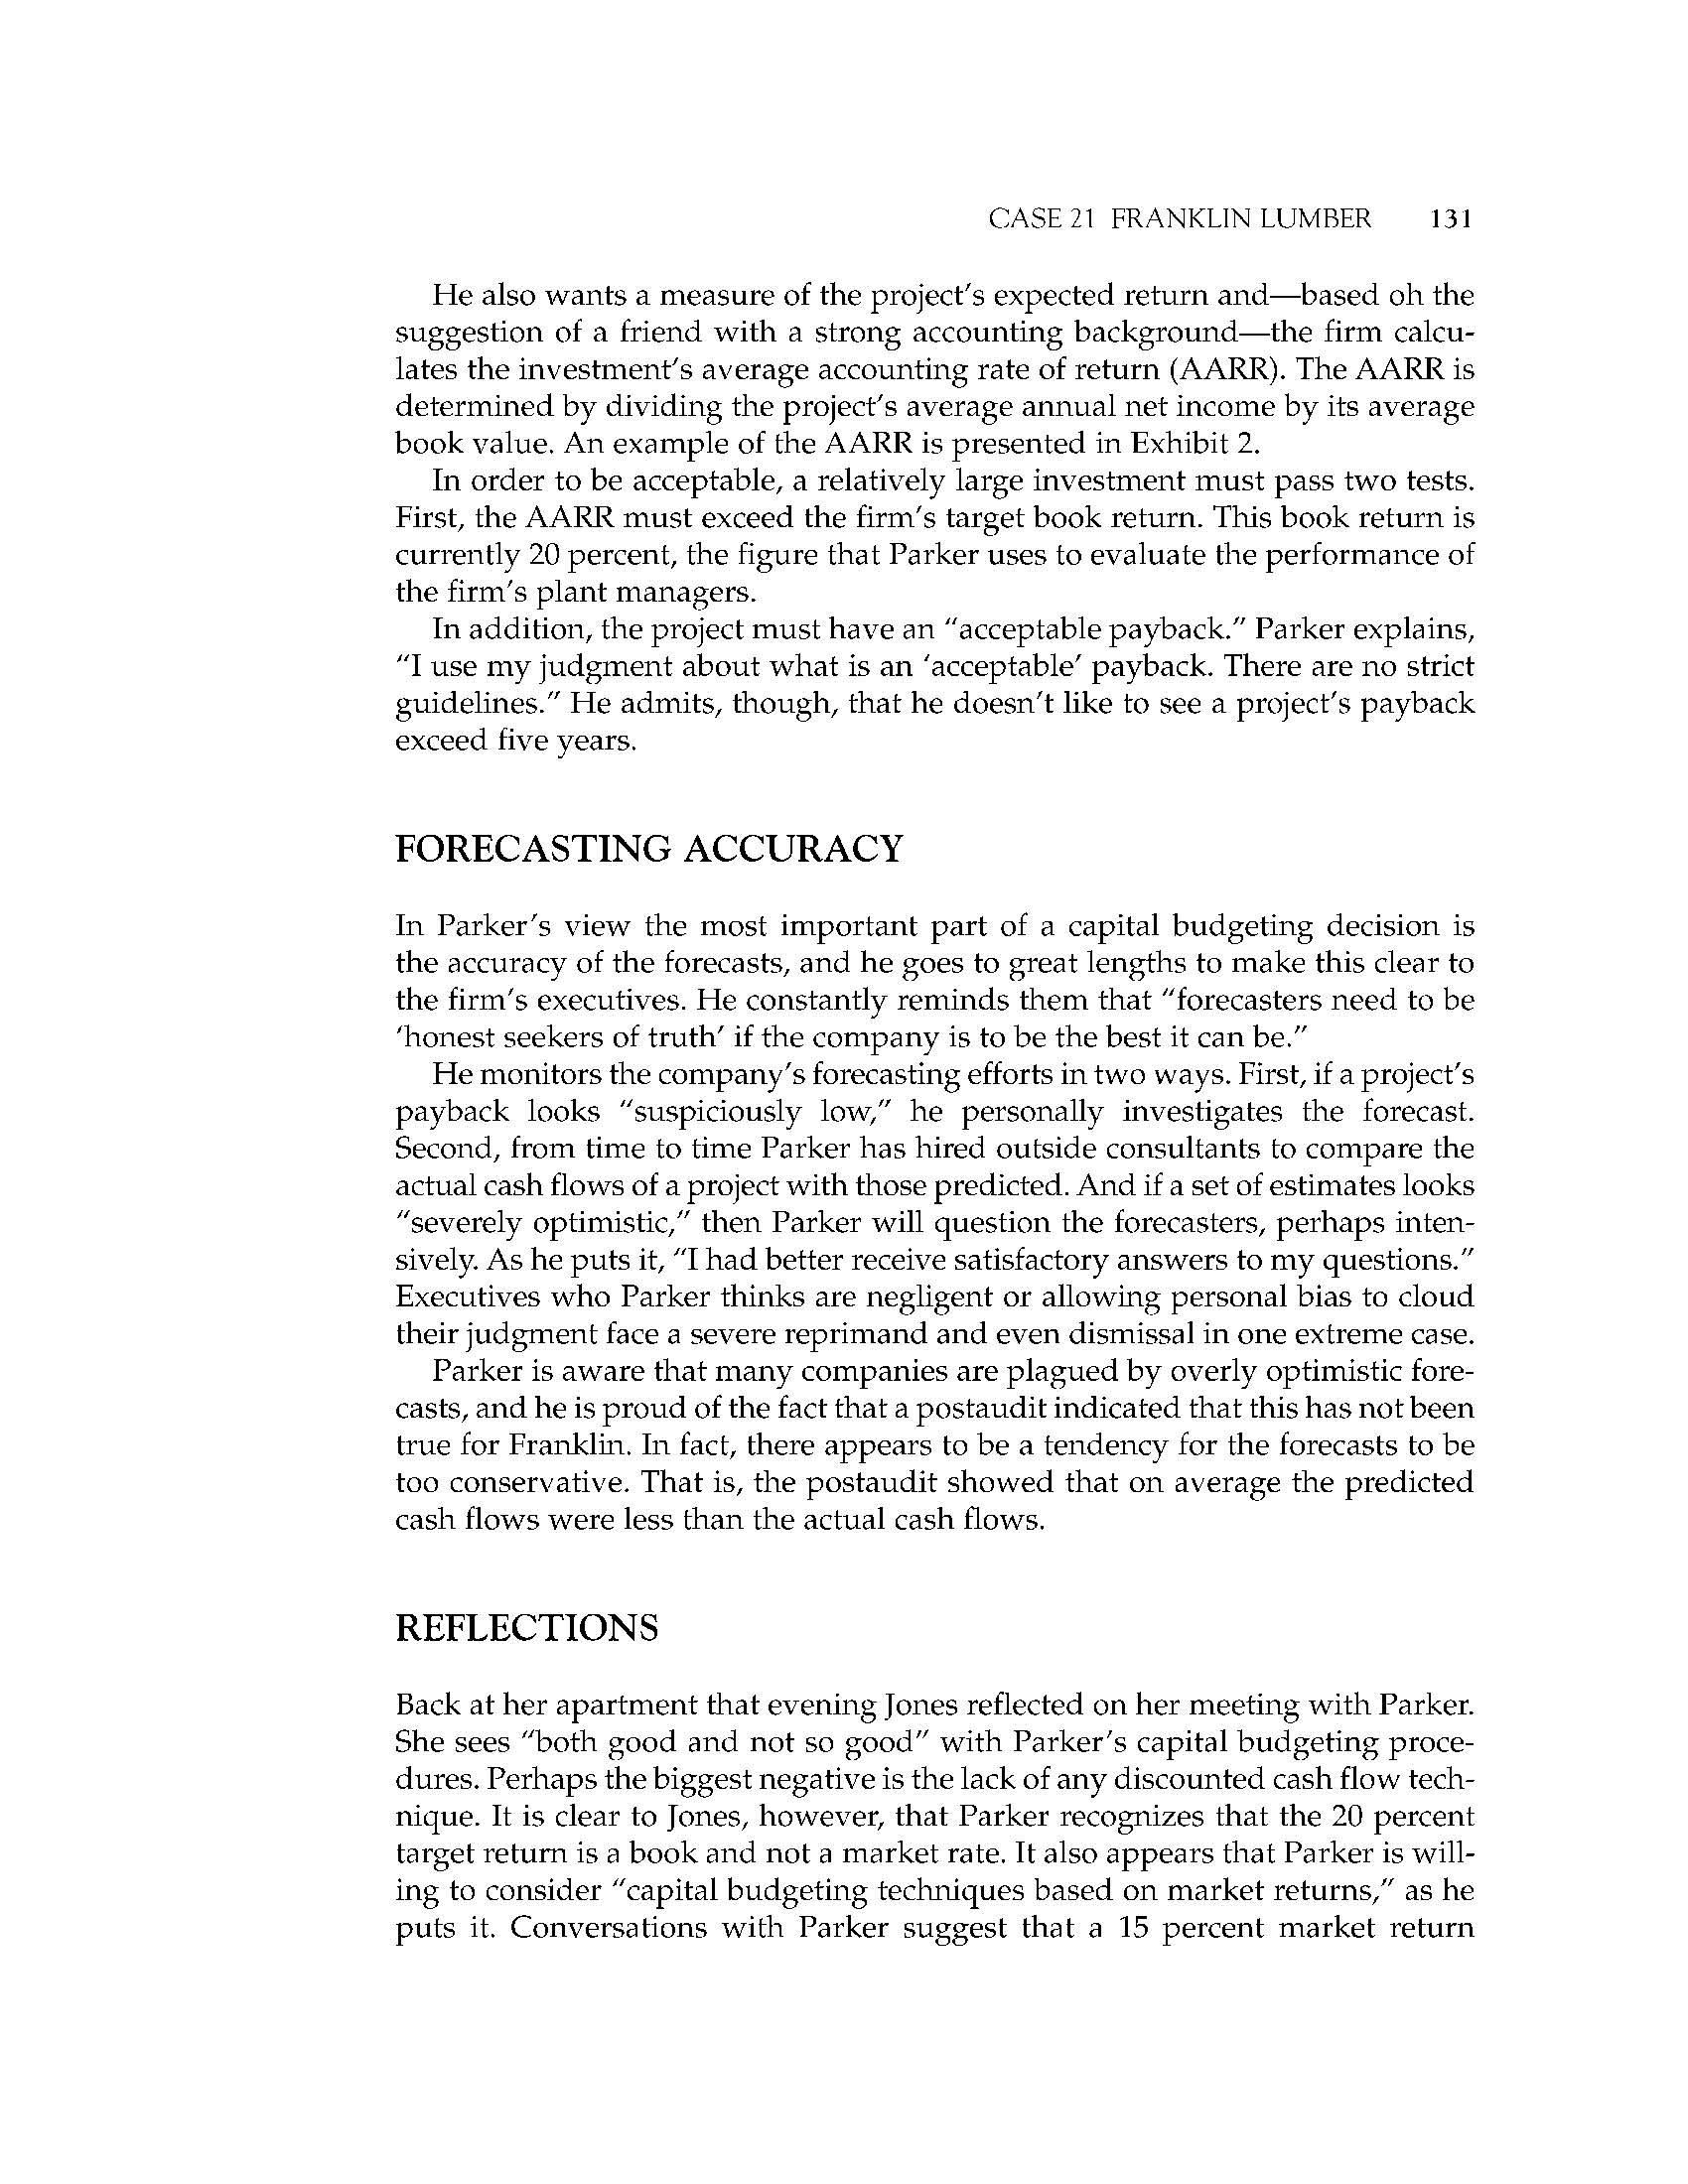 cartwright lumber case study solution Free case study solution & analysis | caseforestcom memo re clarkson lumber to: john doe president, northrup national bank.